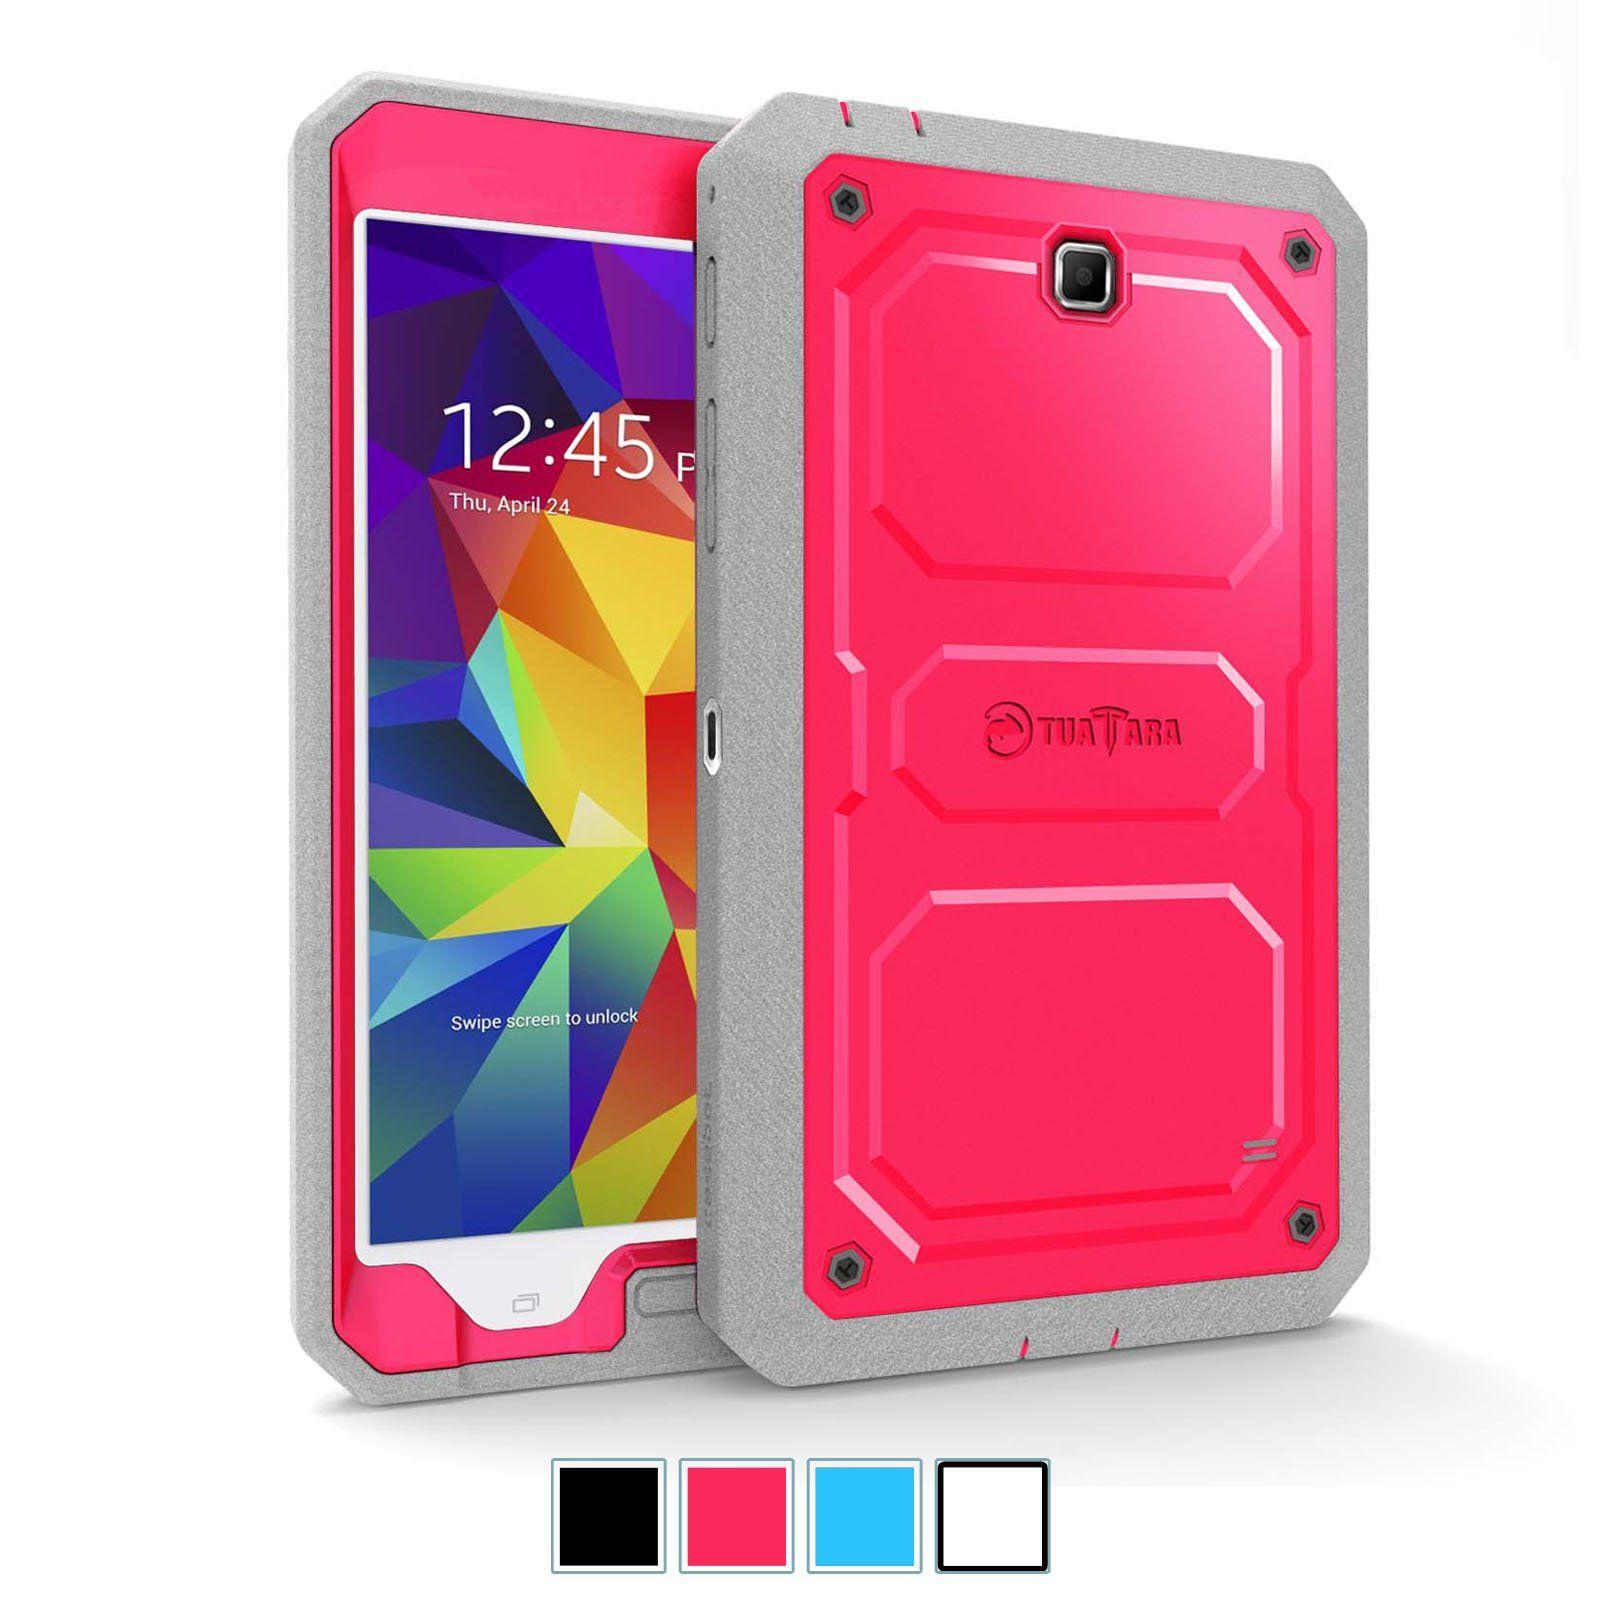 huge discount d8b05 0de8e Amazon.com: Fintie Samsung Galaxy Tab 4 8.0 Case [CaseBot Tuatara ...